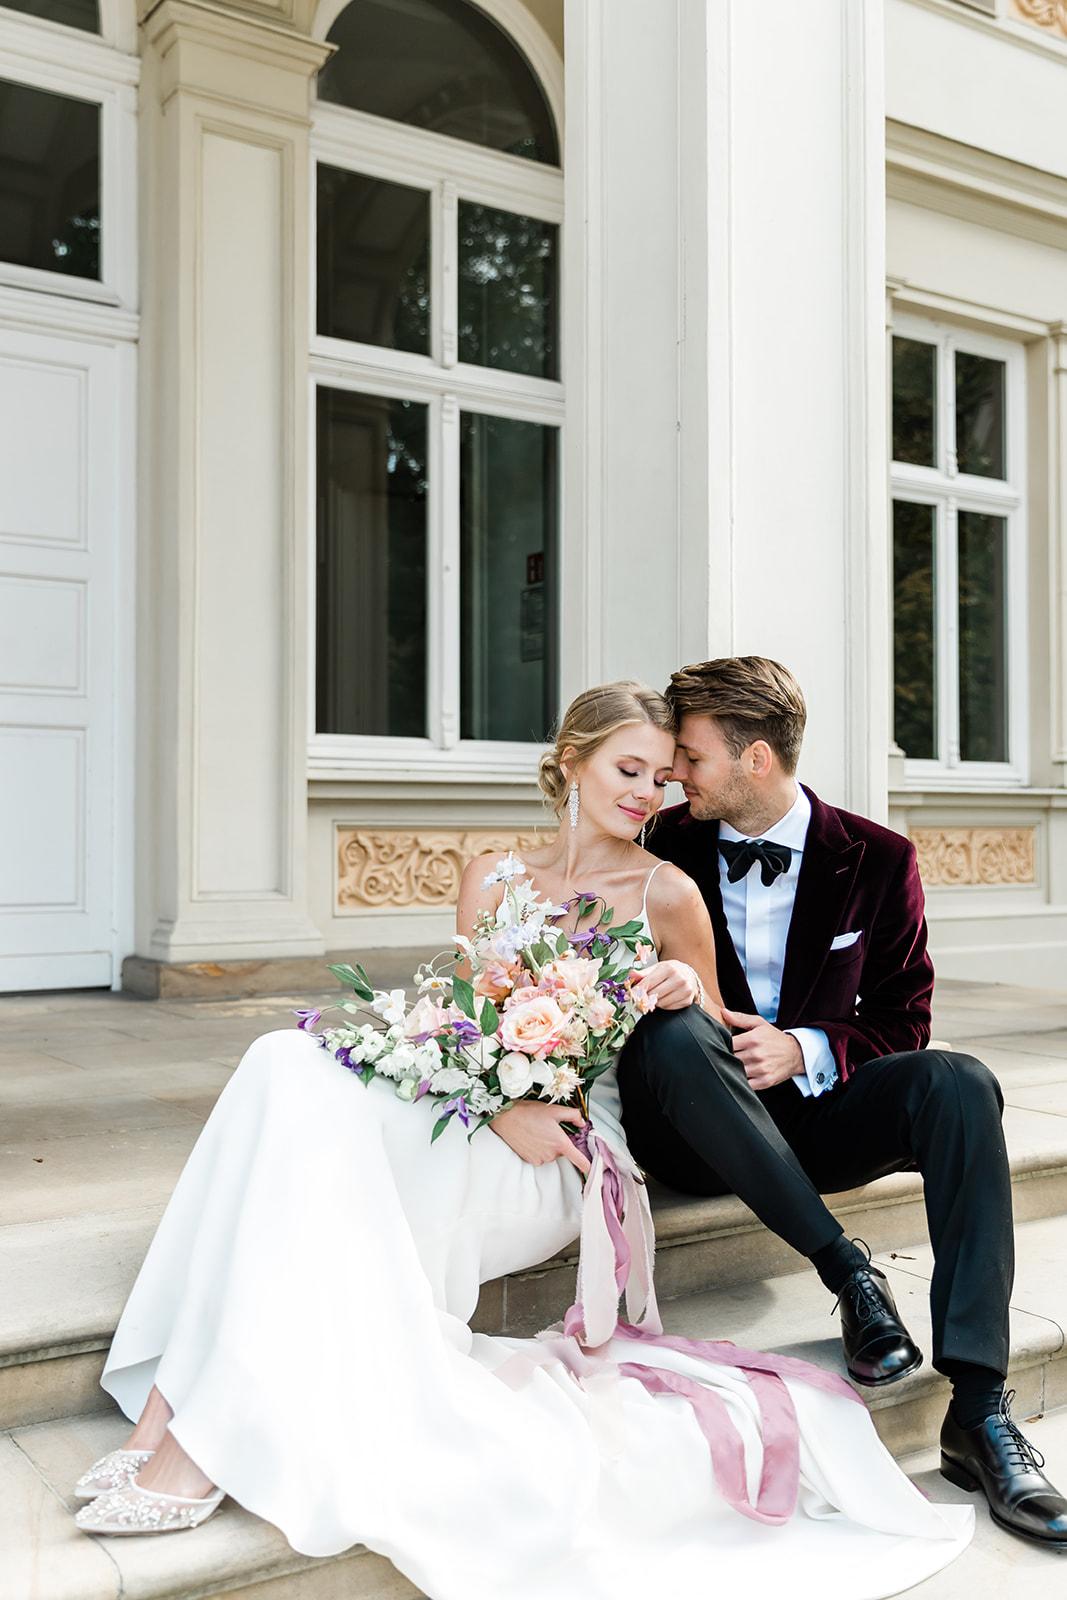 Minoga – French Romance